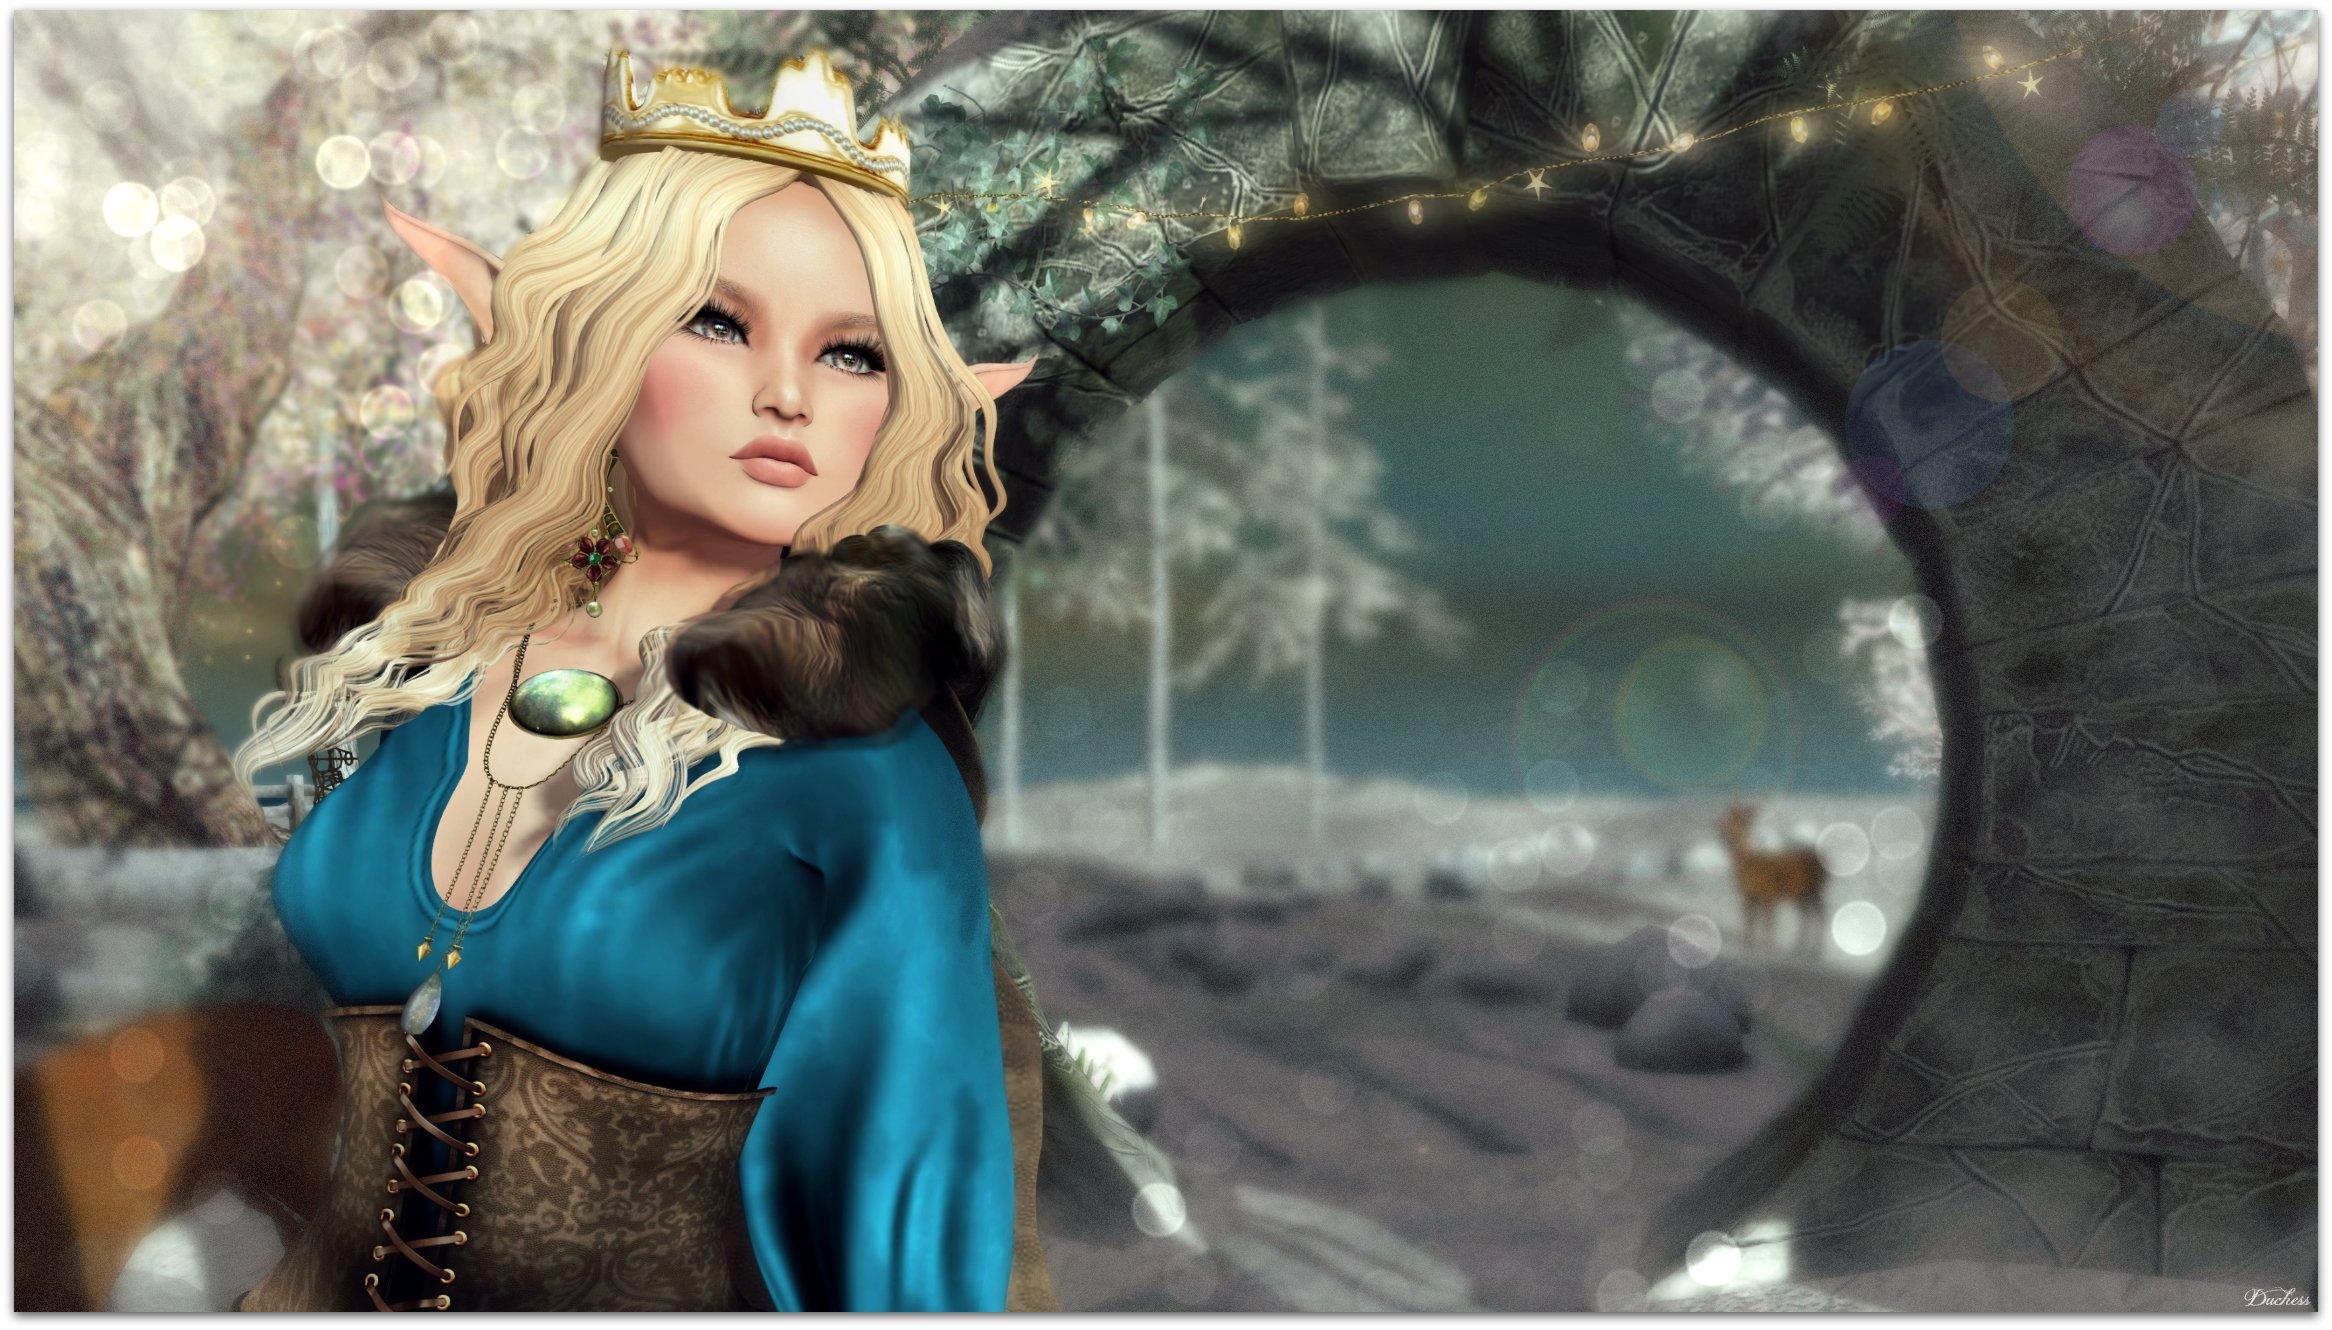 Midwinter Elf